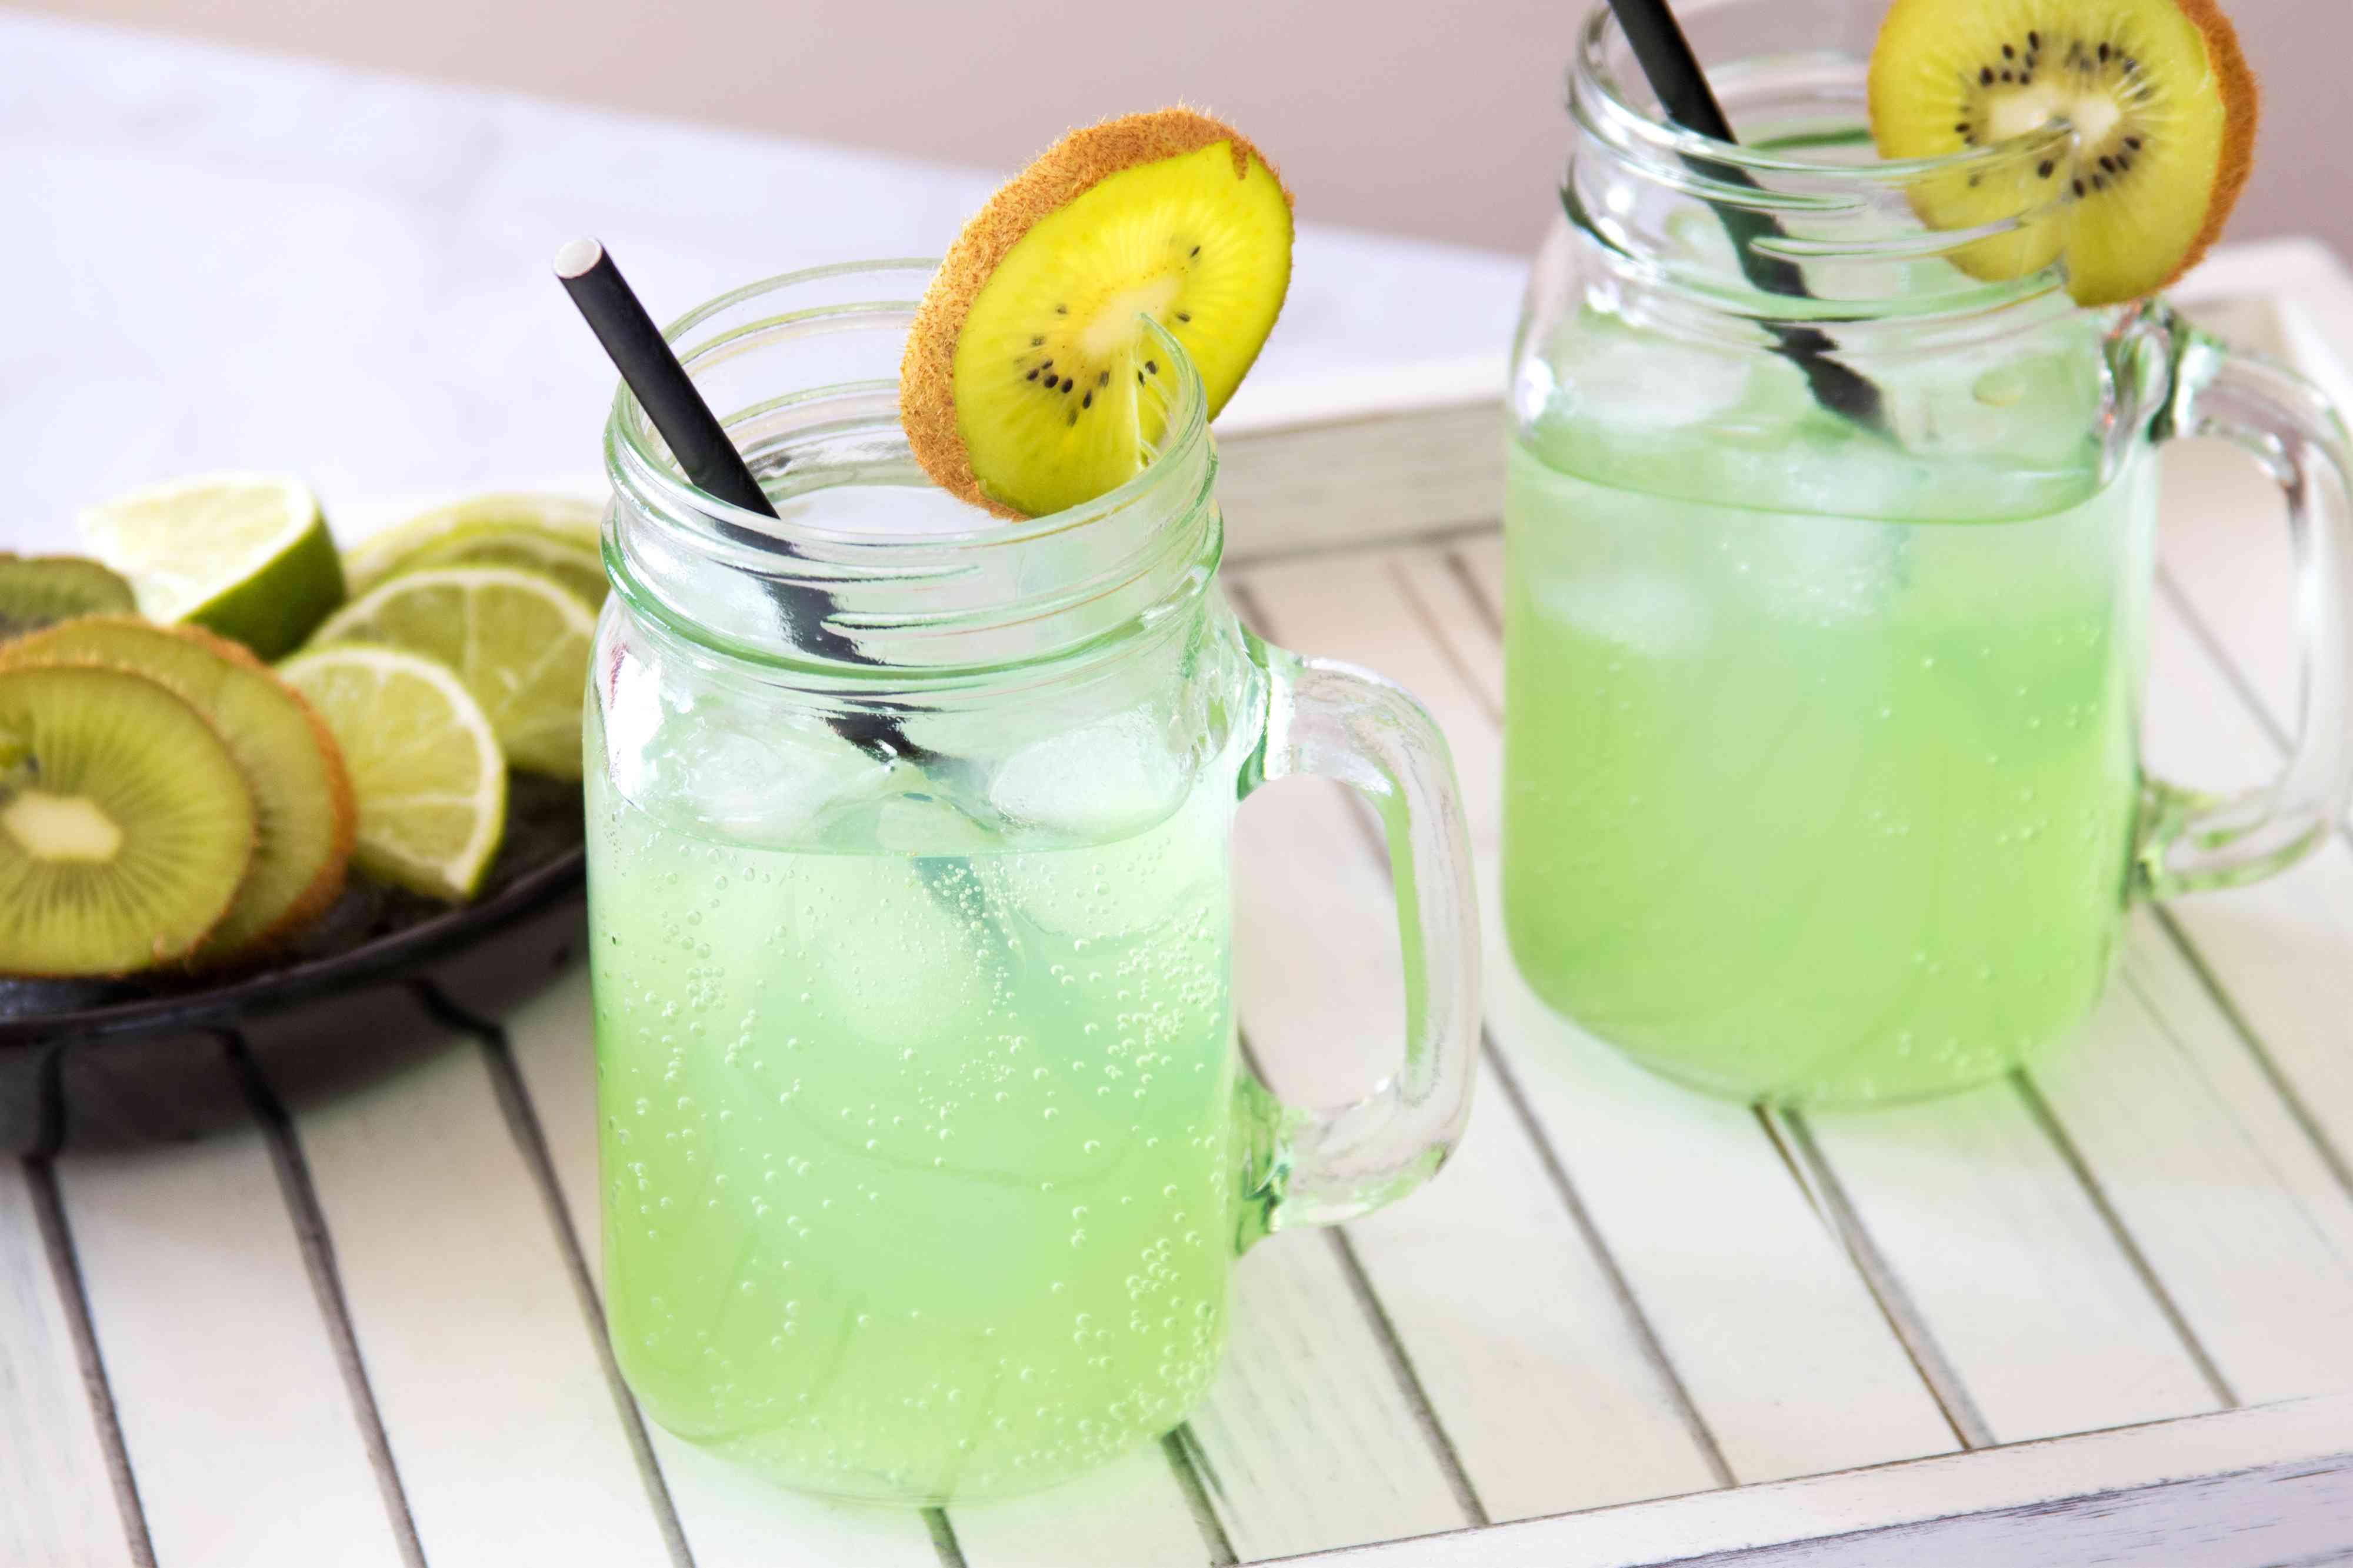 Green Lemonade No-Proof Cocktail